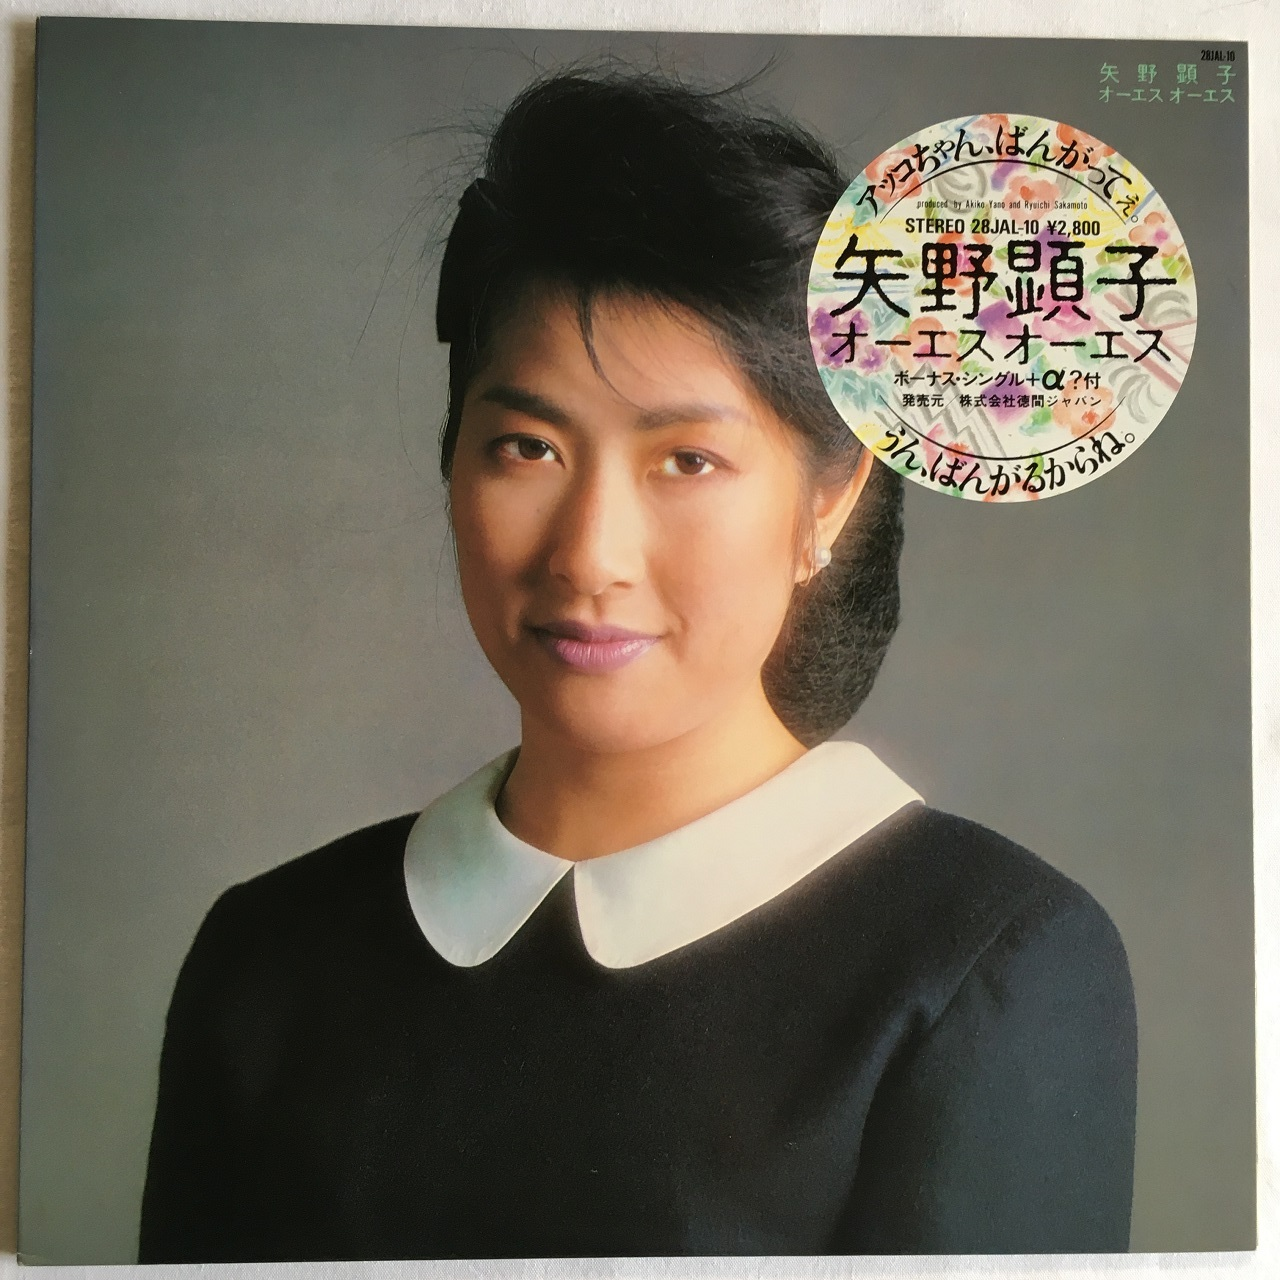 【LP + 7inch・国内盤】矢野顕子 / オーエス オーエス